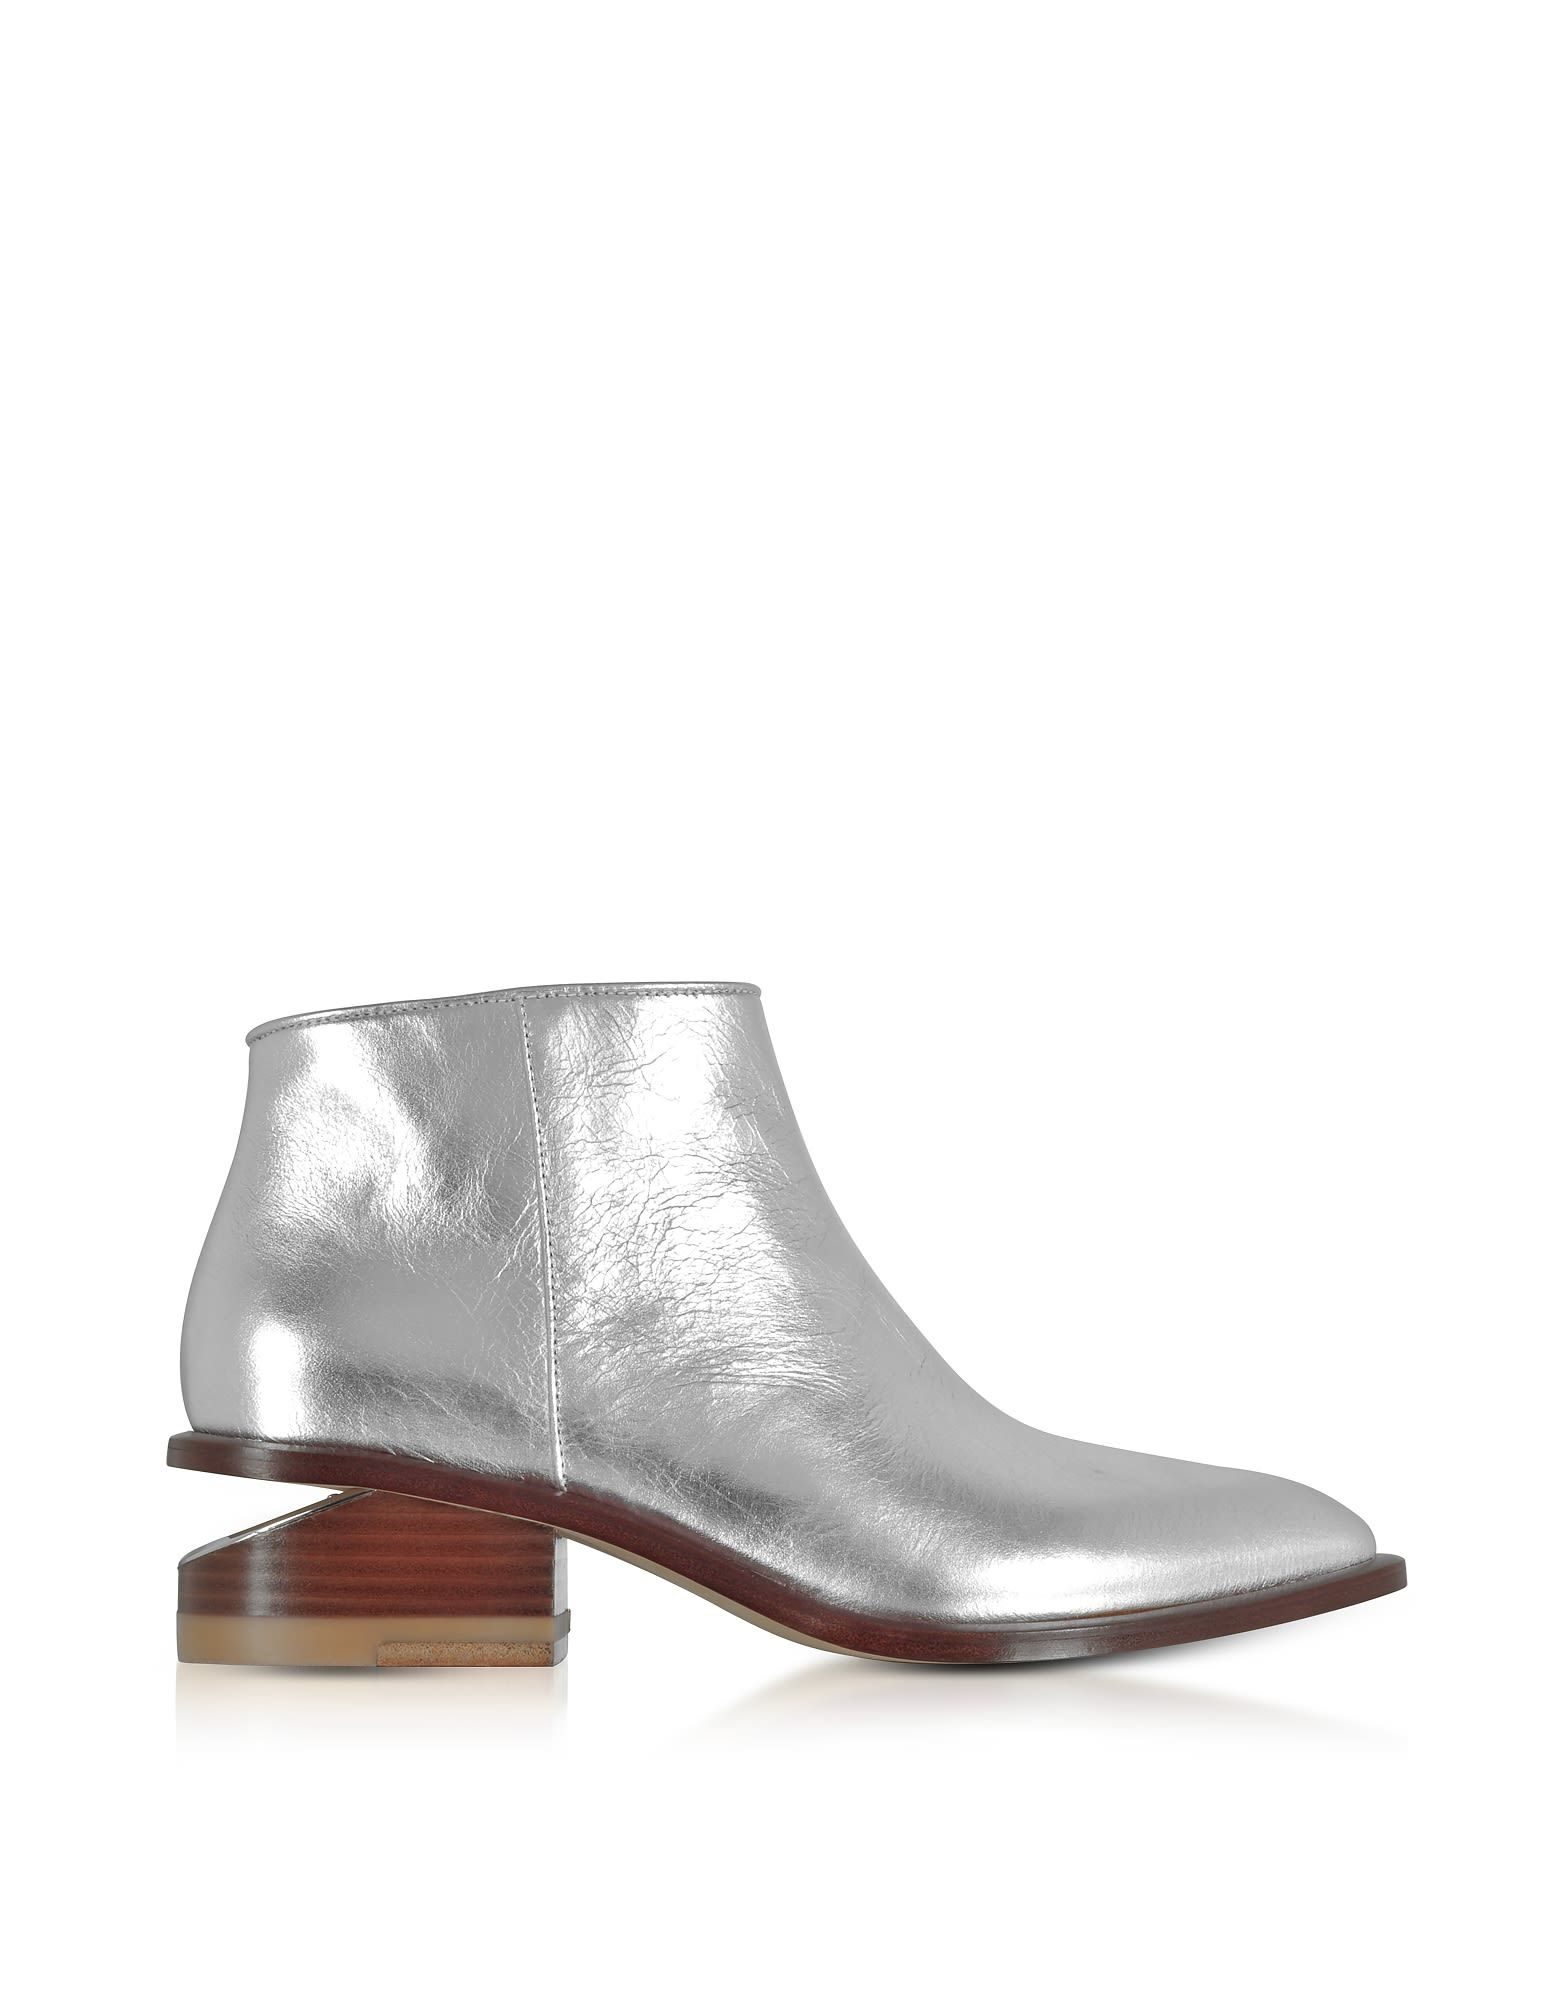 Alexander Wang Designer Shoes, Kori Metallic Leather Booties w/Rhodium Heel